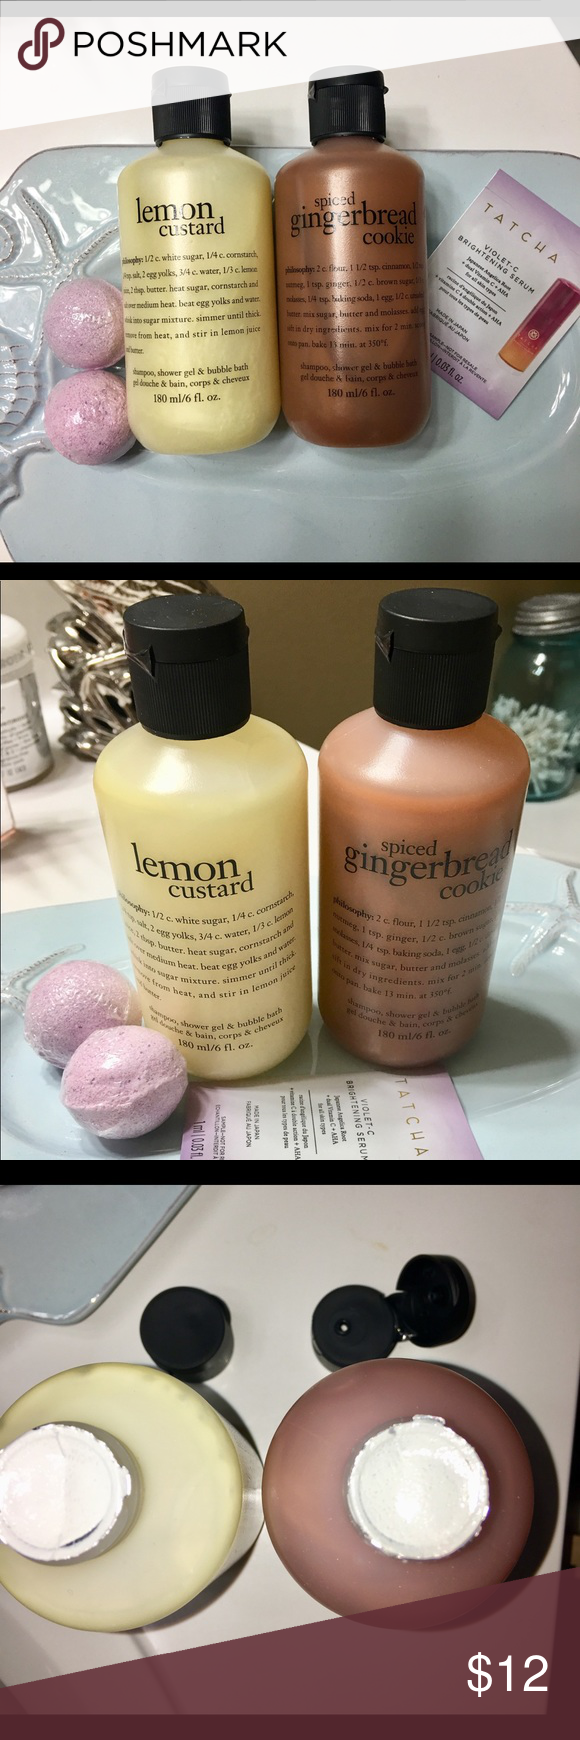 Philosophy Shampoo Body Wash Set Bath Bomb Bonus Shampoo Body Wash Body Wash Honey Body Wash